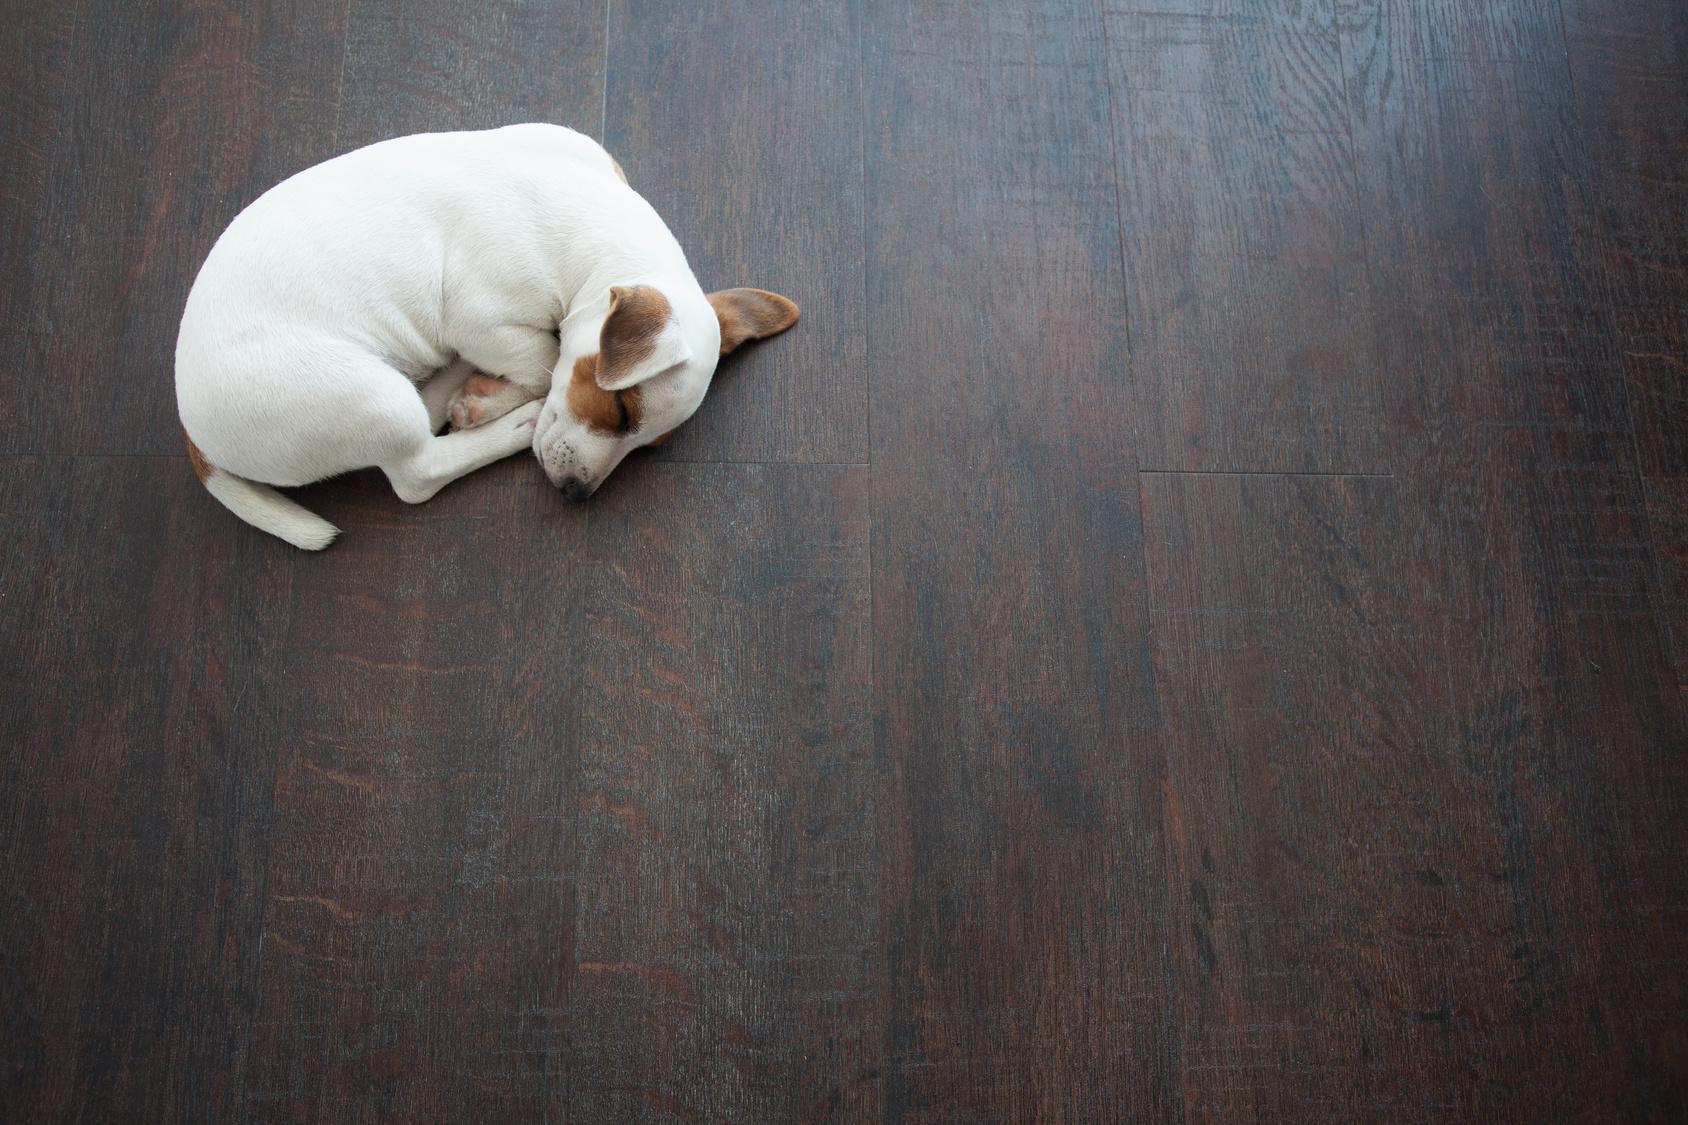 Pets and hardwood flooring coexisting